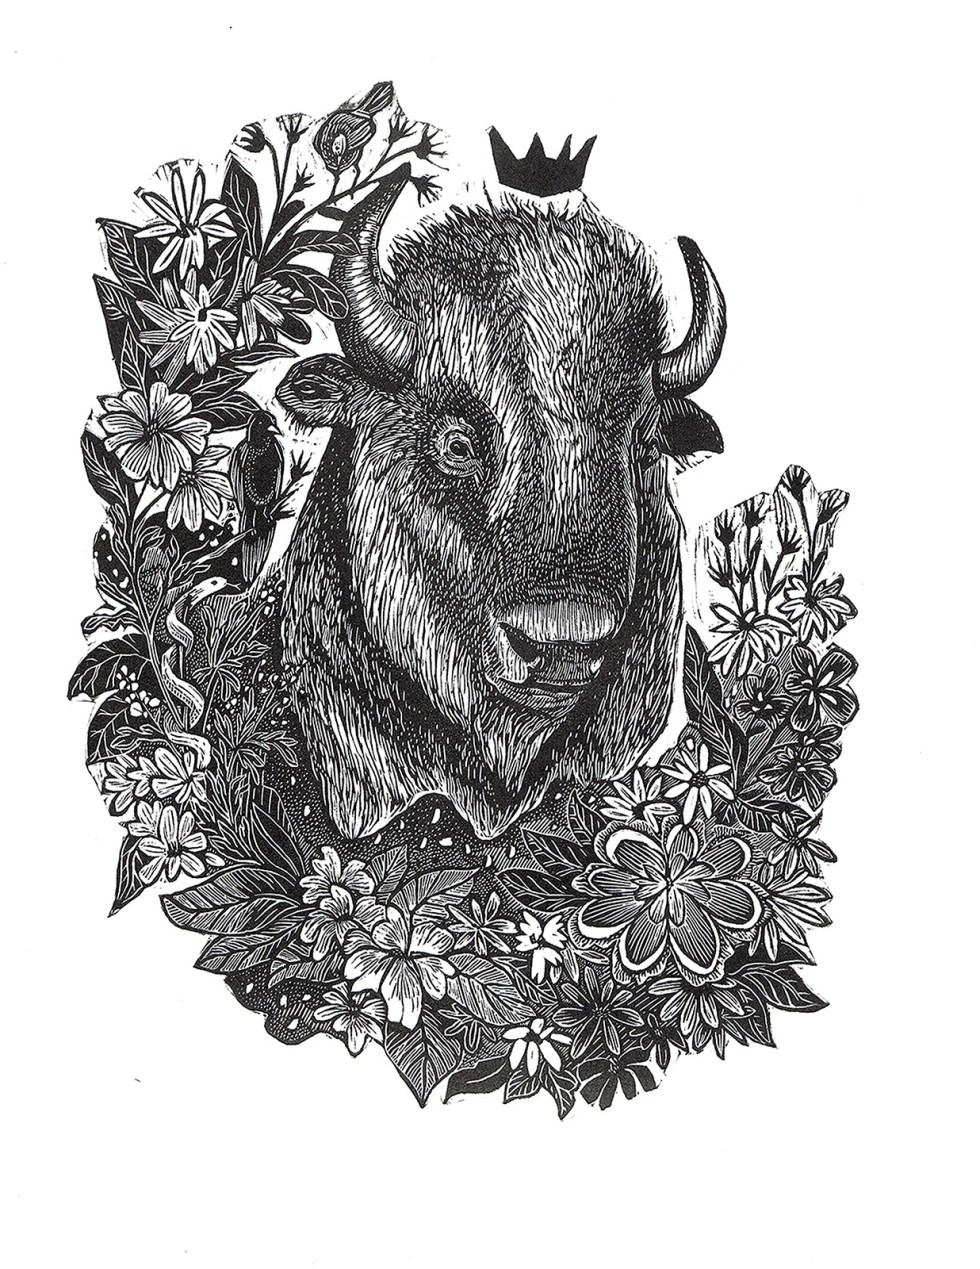 Trophy III Bison Print Edition by Johanna Mueller